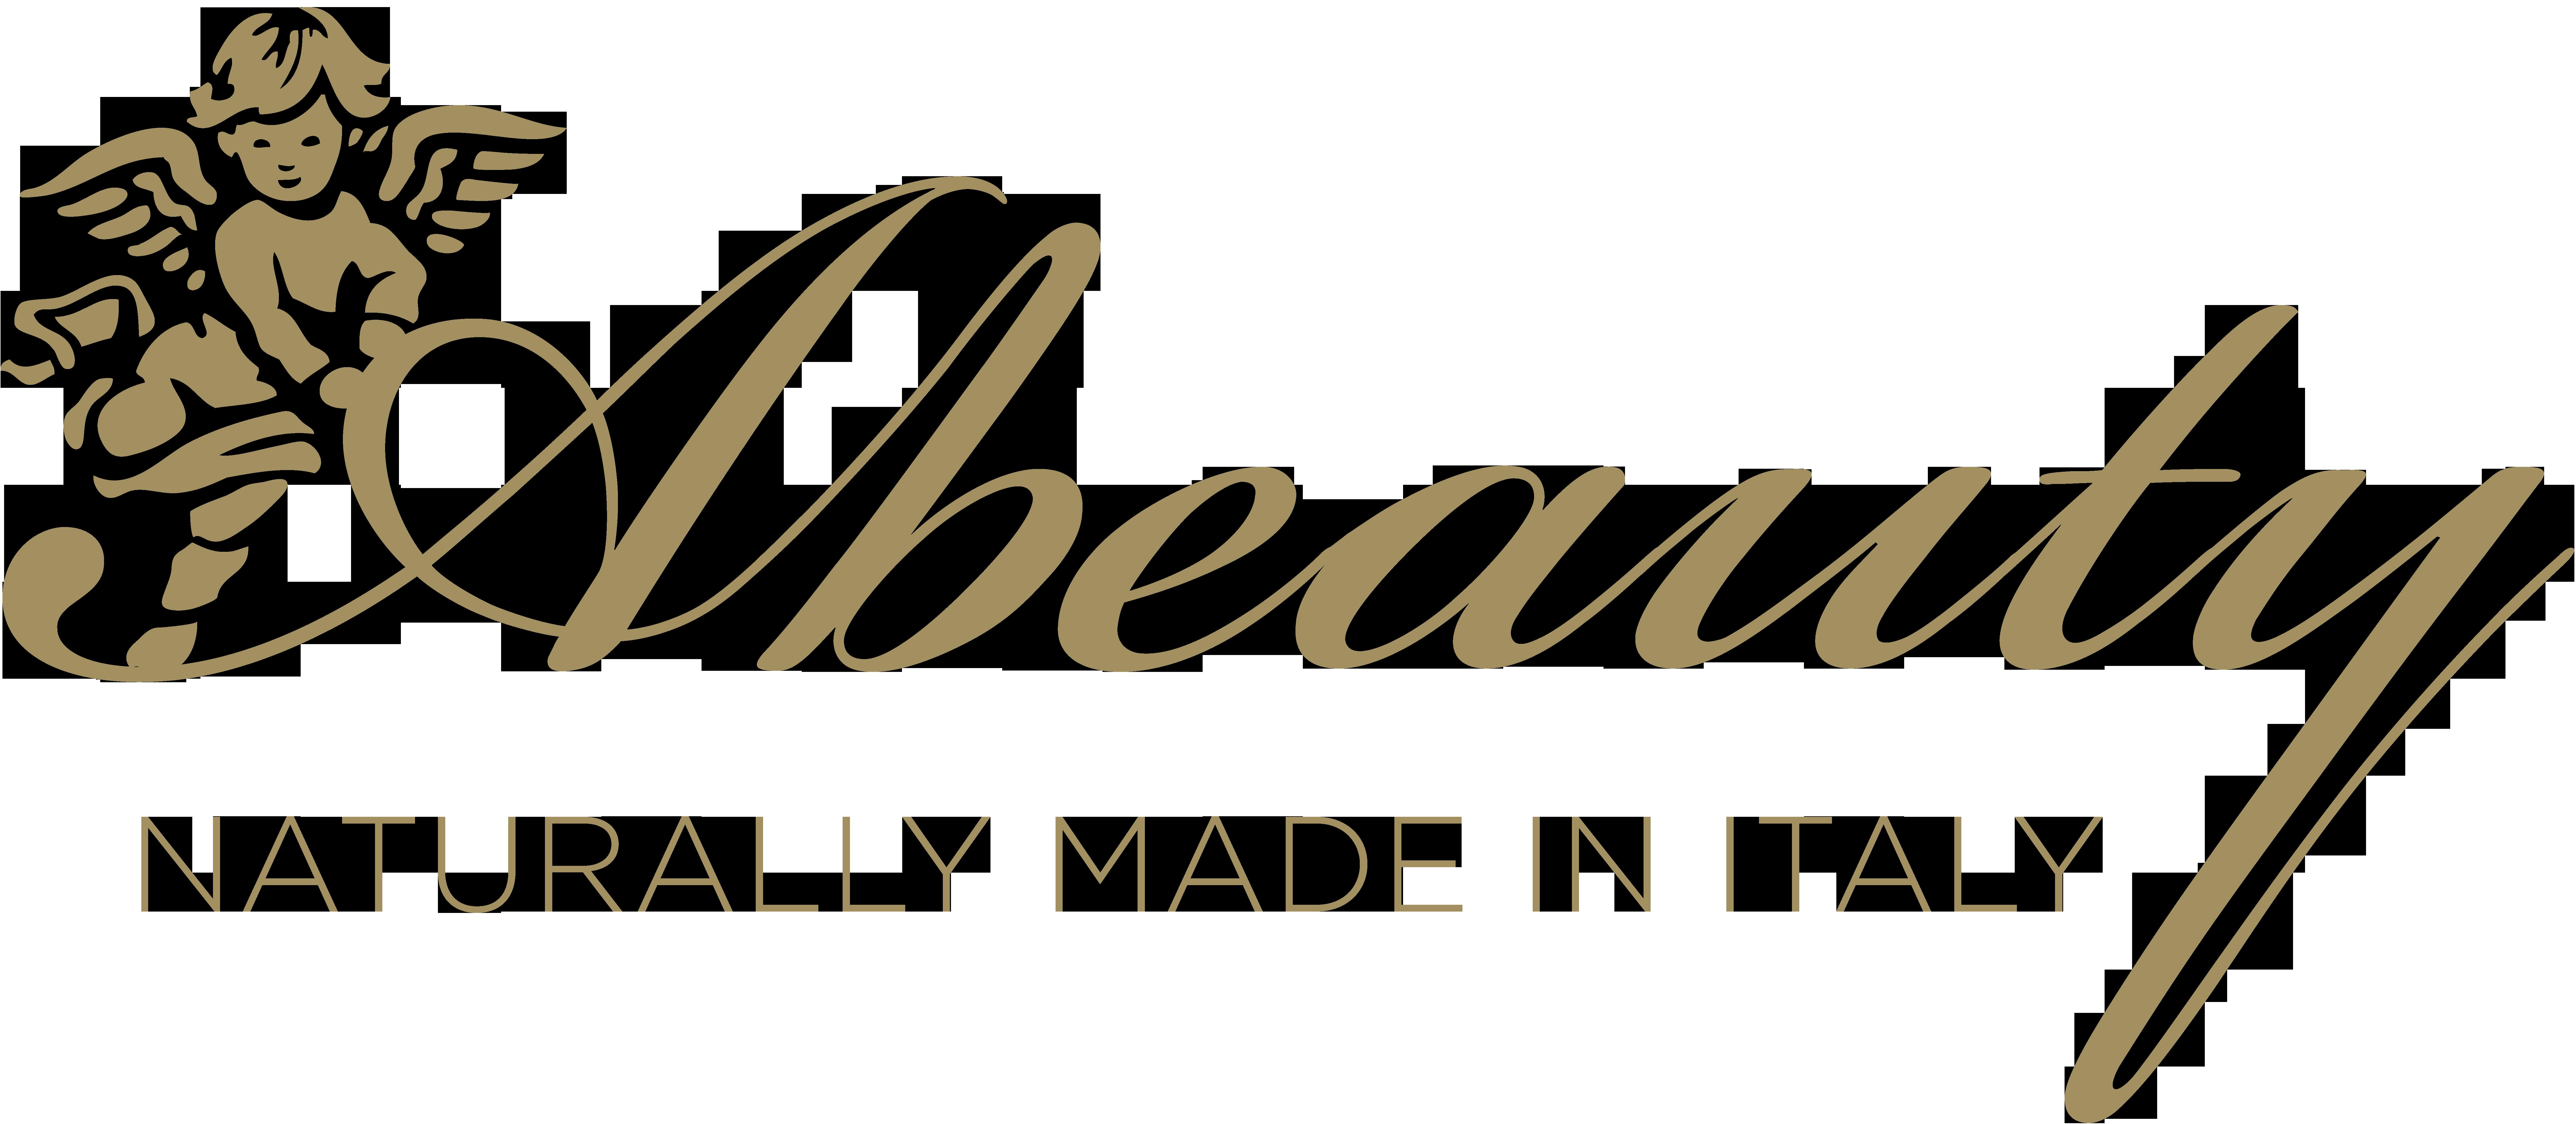 Abeauty logo